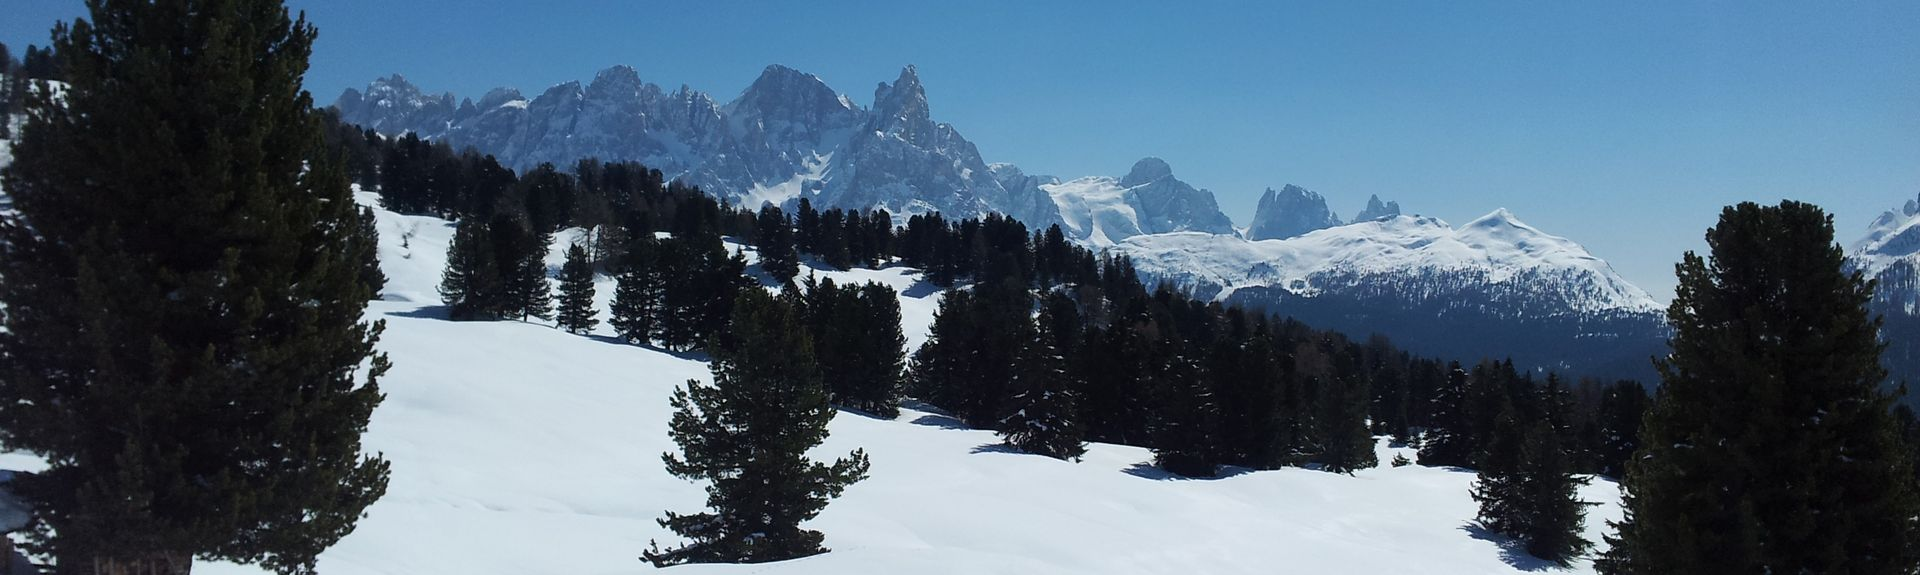 Völs am Schlern, Alto Adige, Trentino-Alto Adige/South Tyrol, Italy